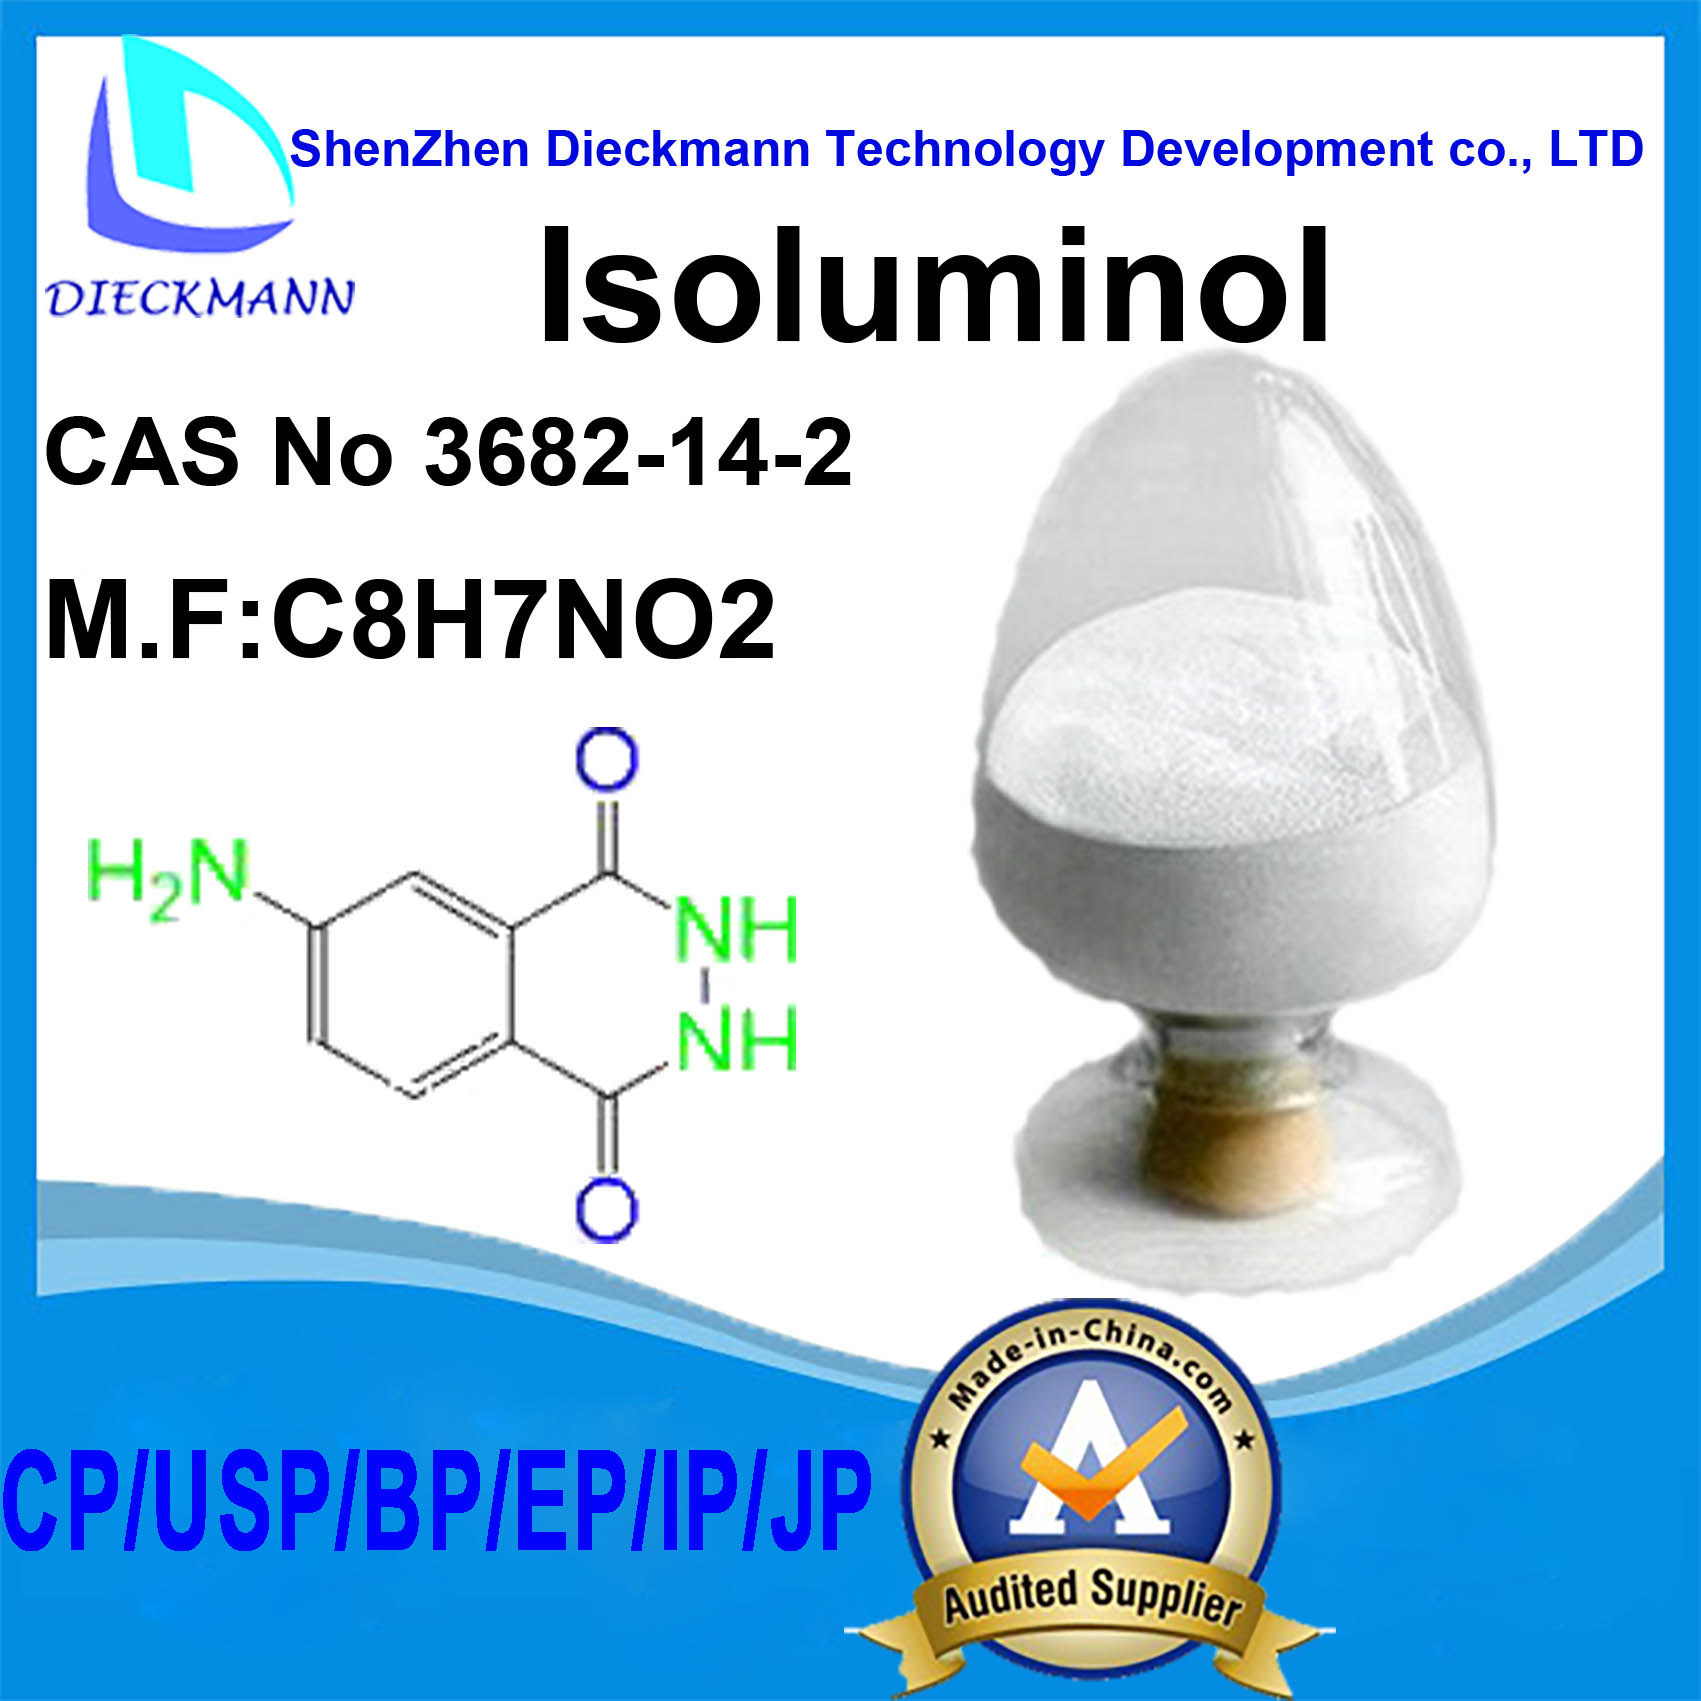 Isoluminol CAS No 3682-14-2 for Chemiluminescence Reagent